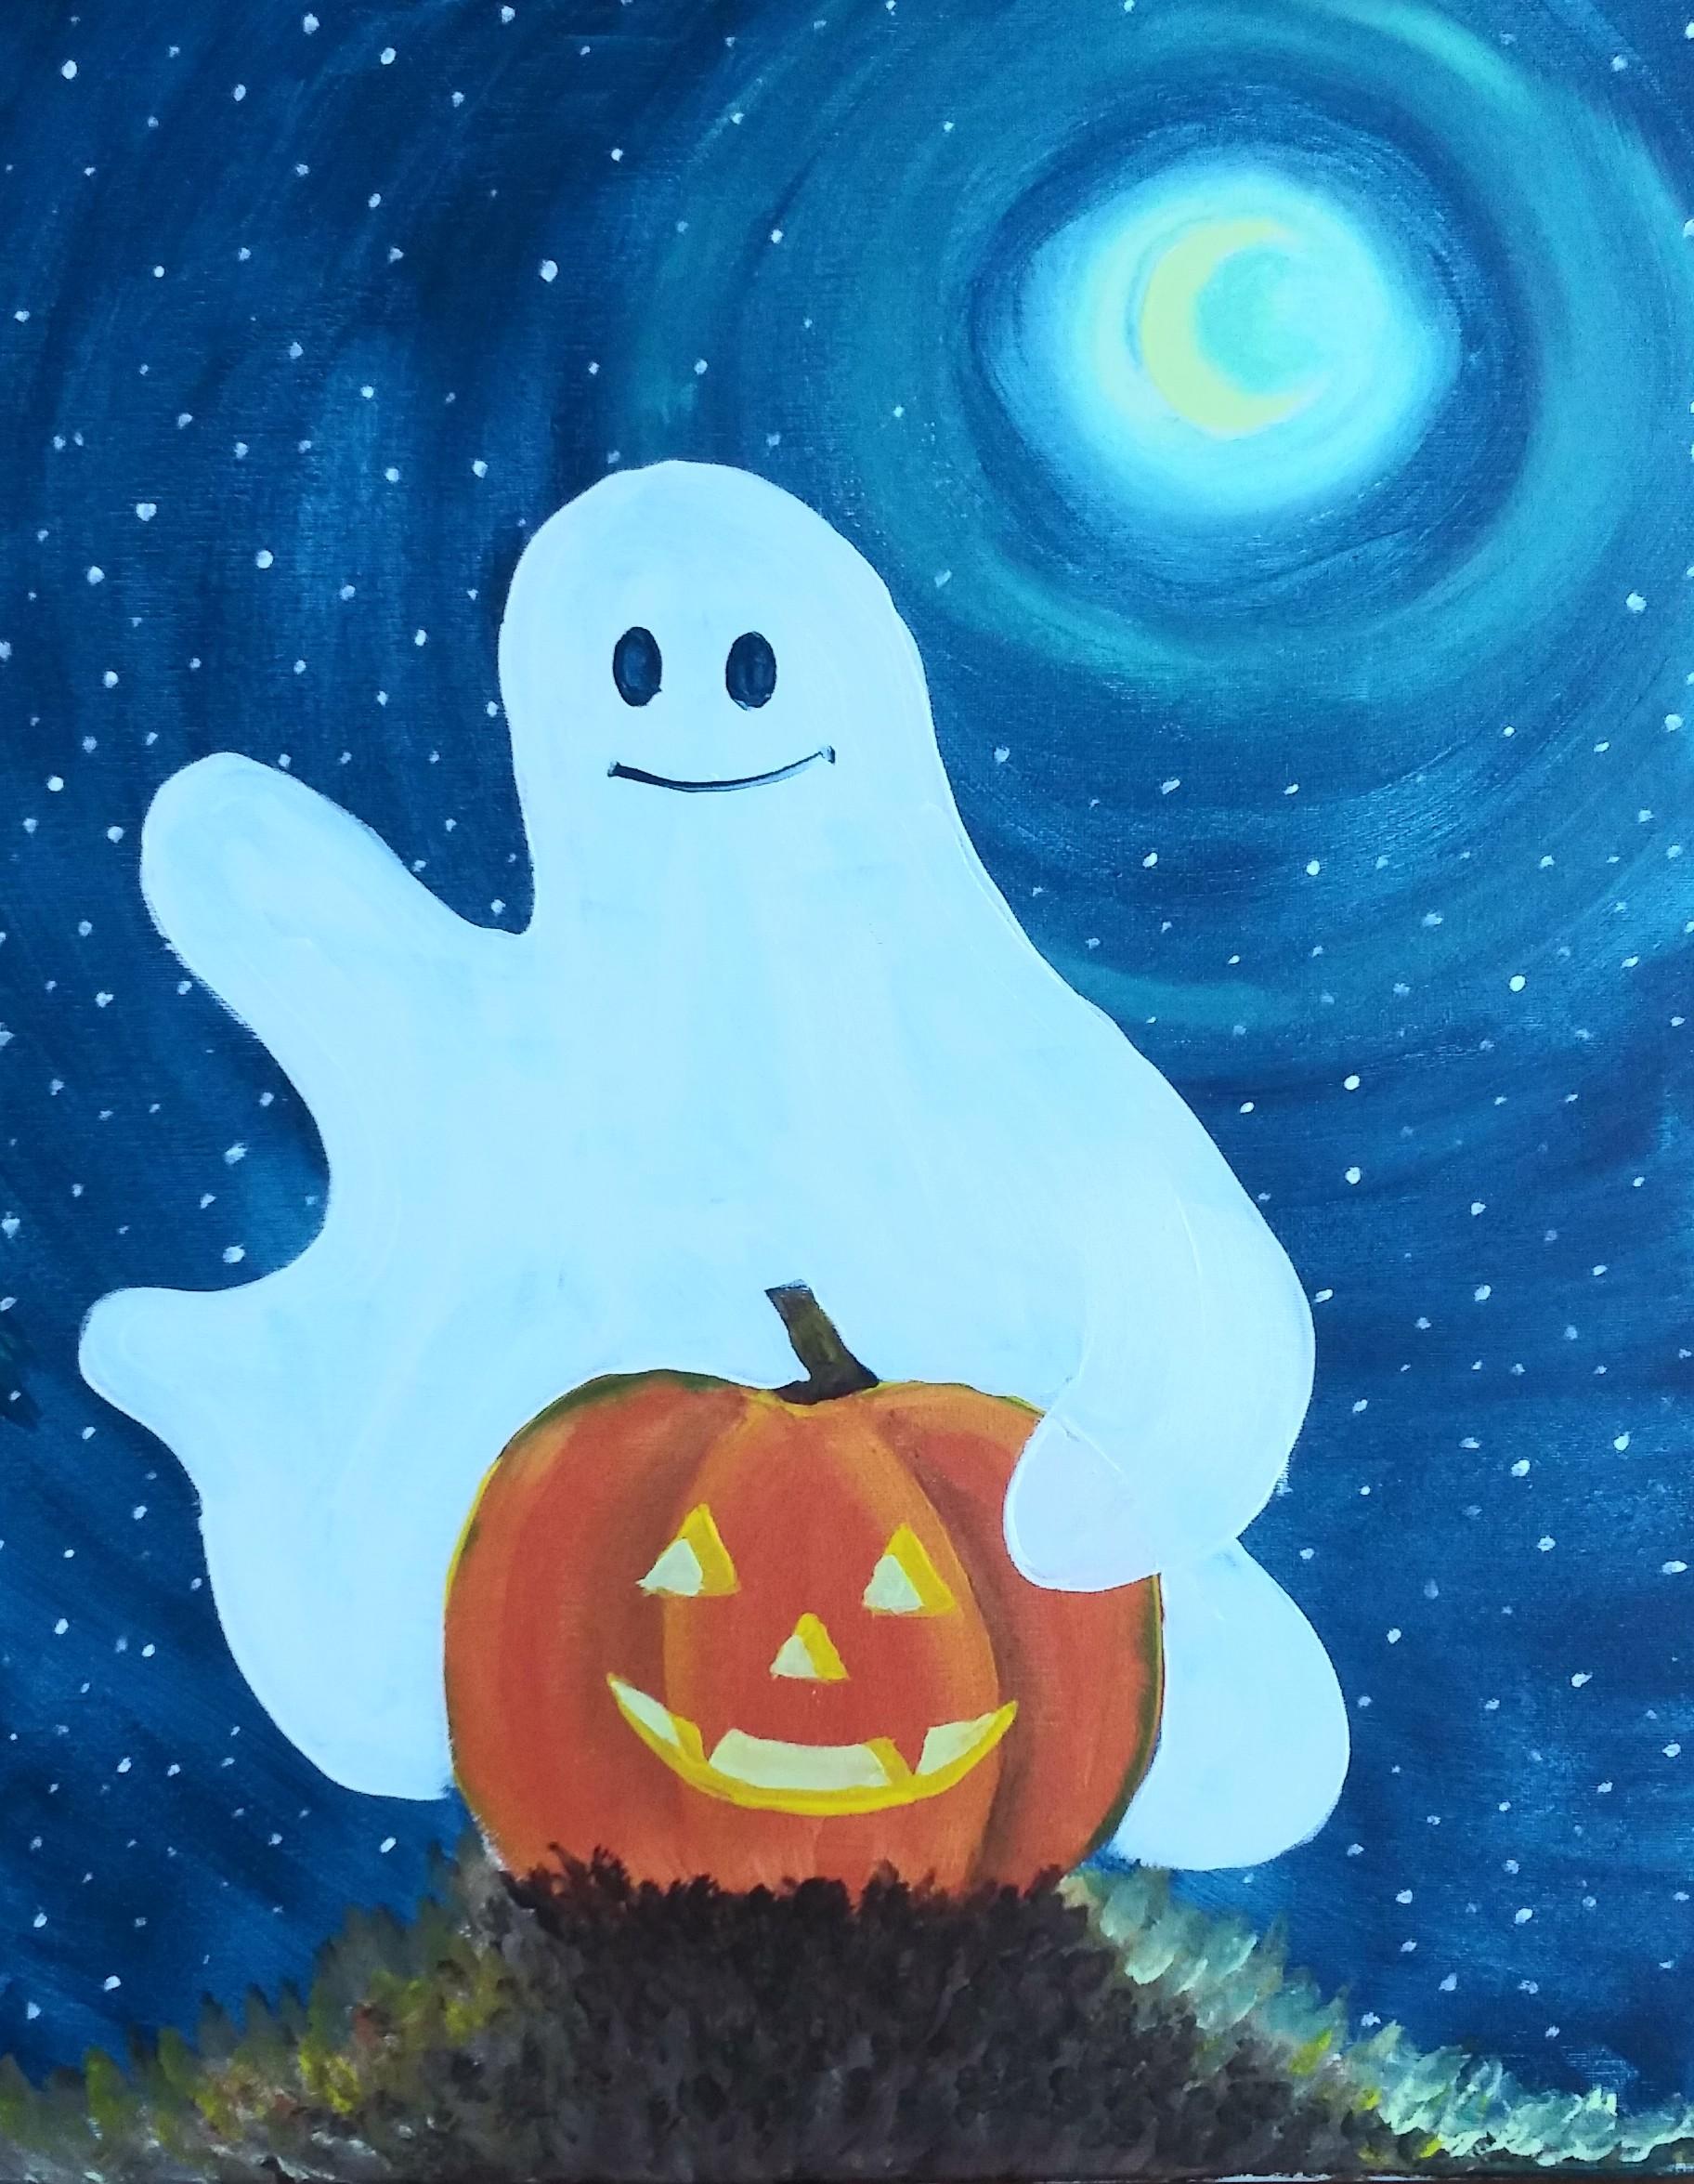 The Pumpkin Ghost